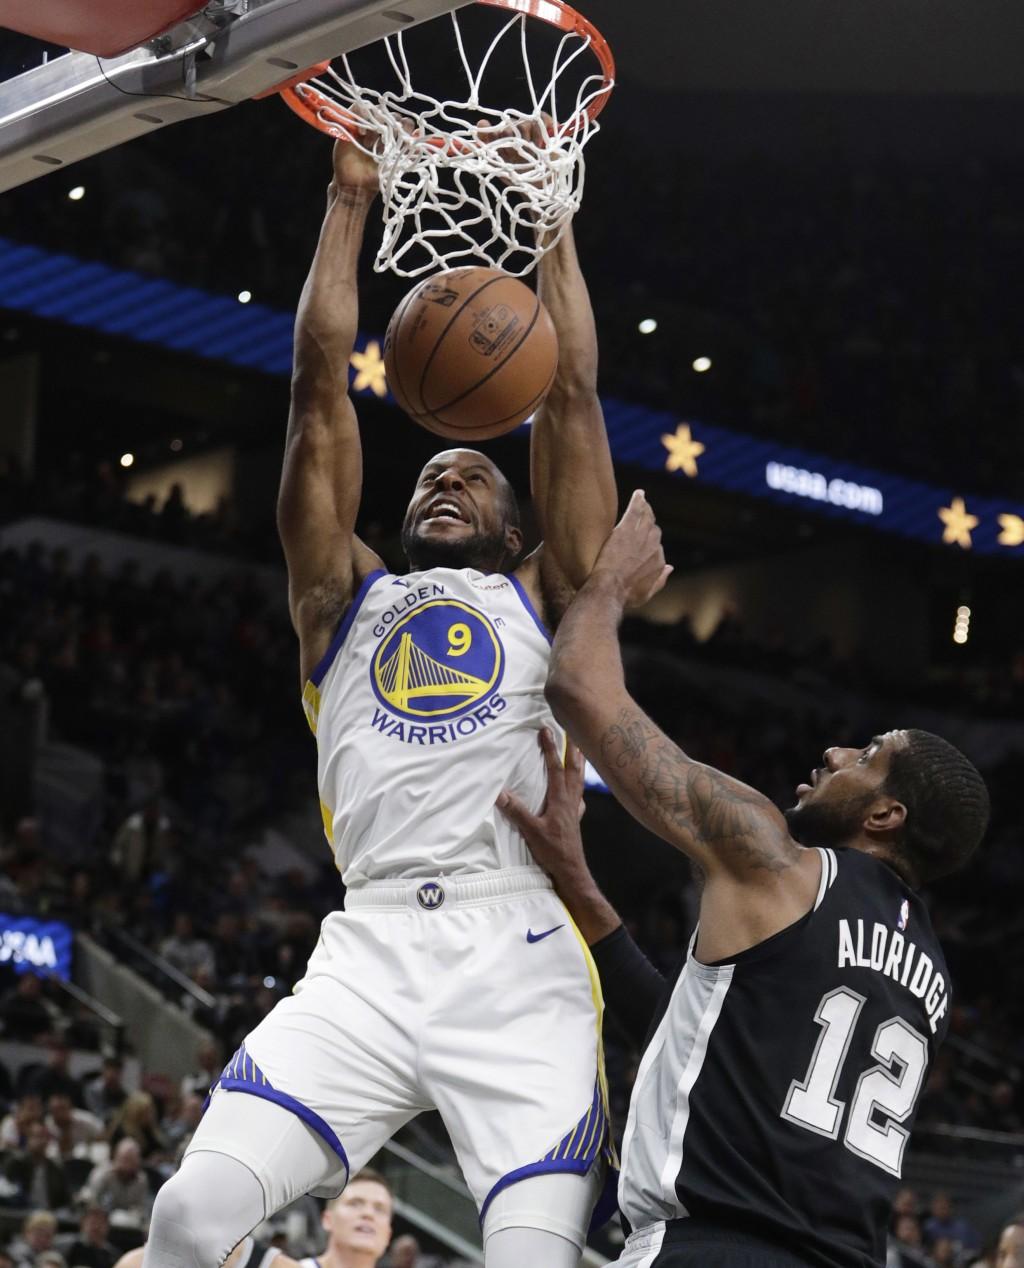 Golden State Warriors guard Andre Iguodala (9) scores over San Antonio Spurs forward LaMarcus Aldridge (12) during the first half of an NBA basketball